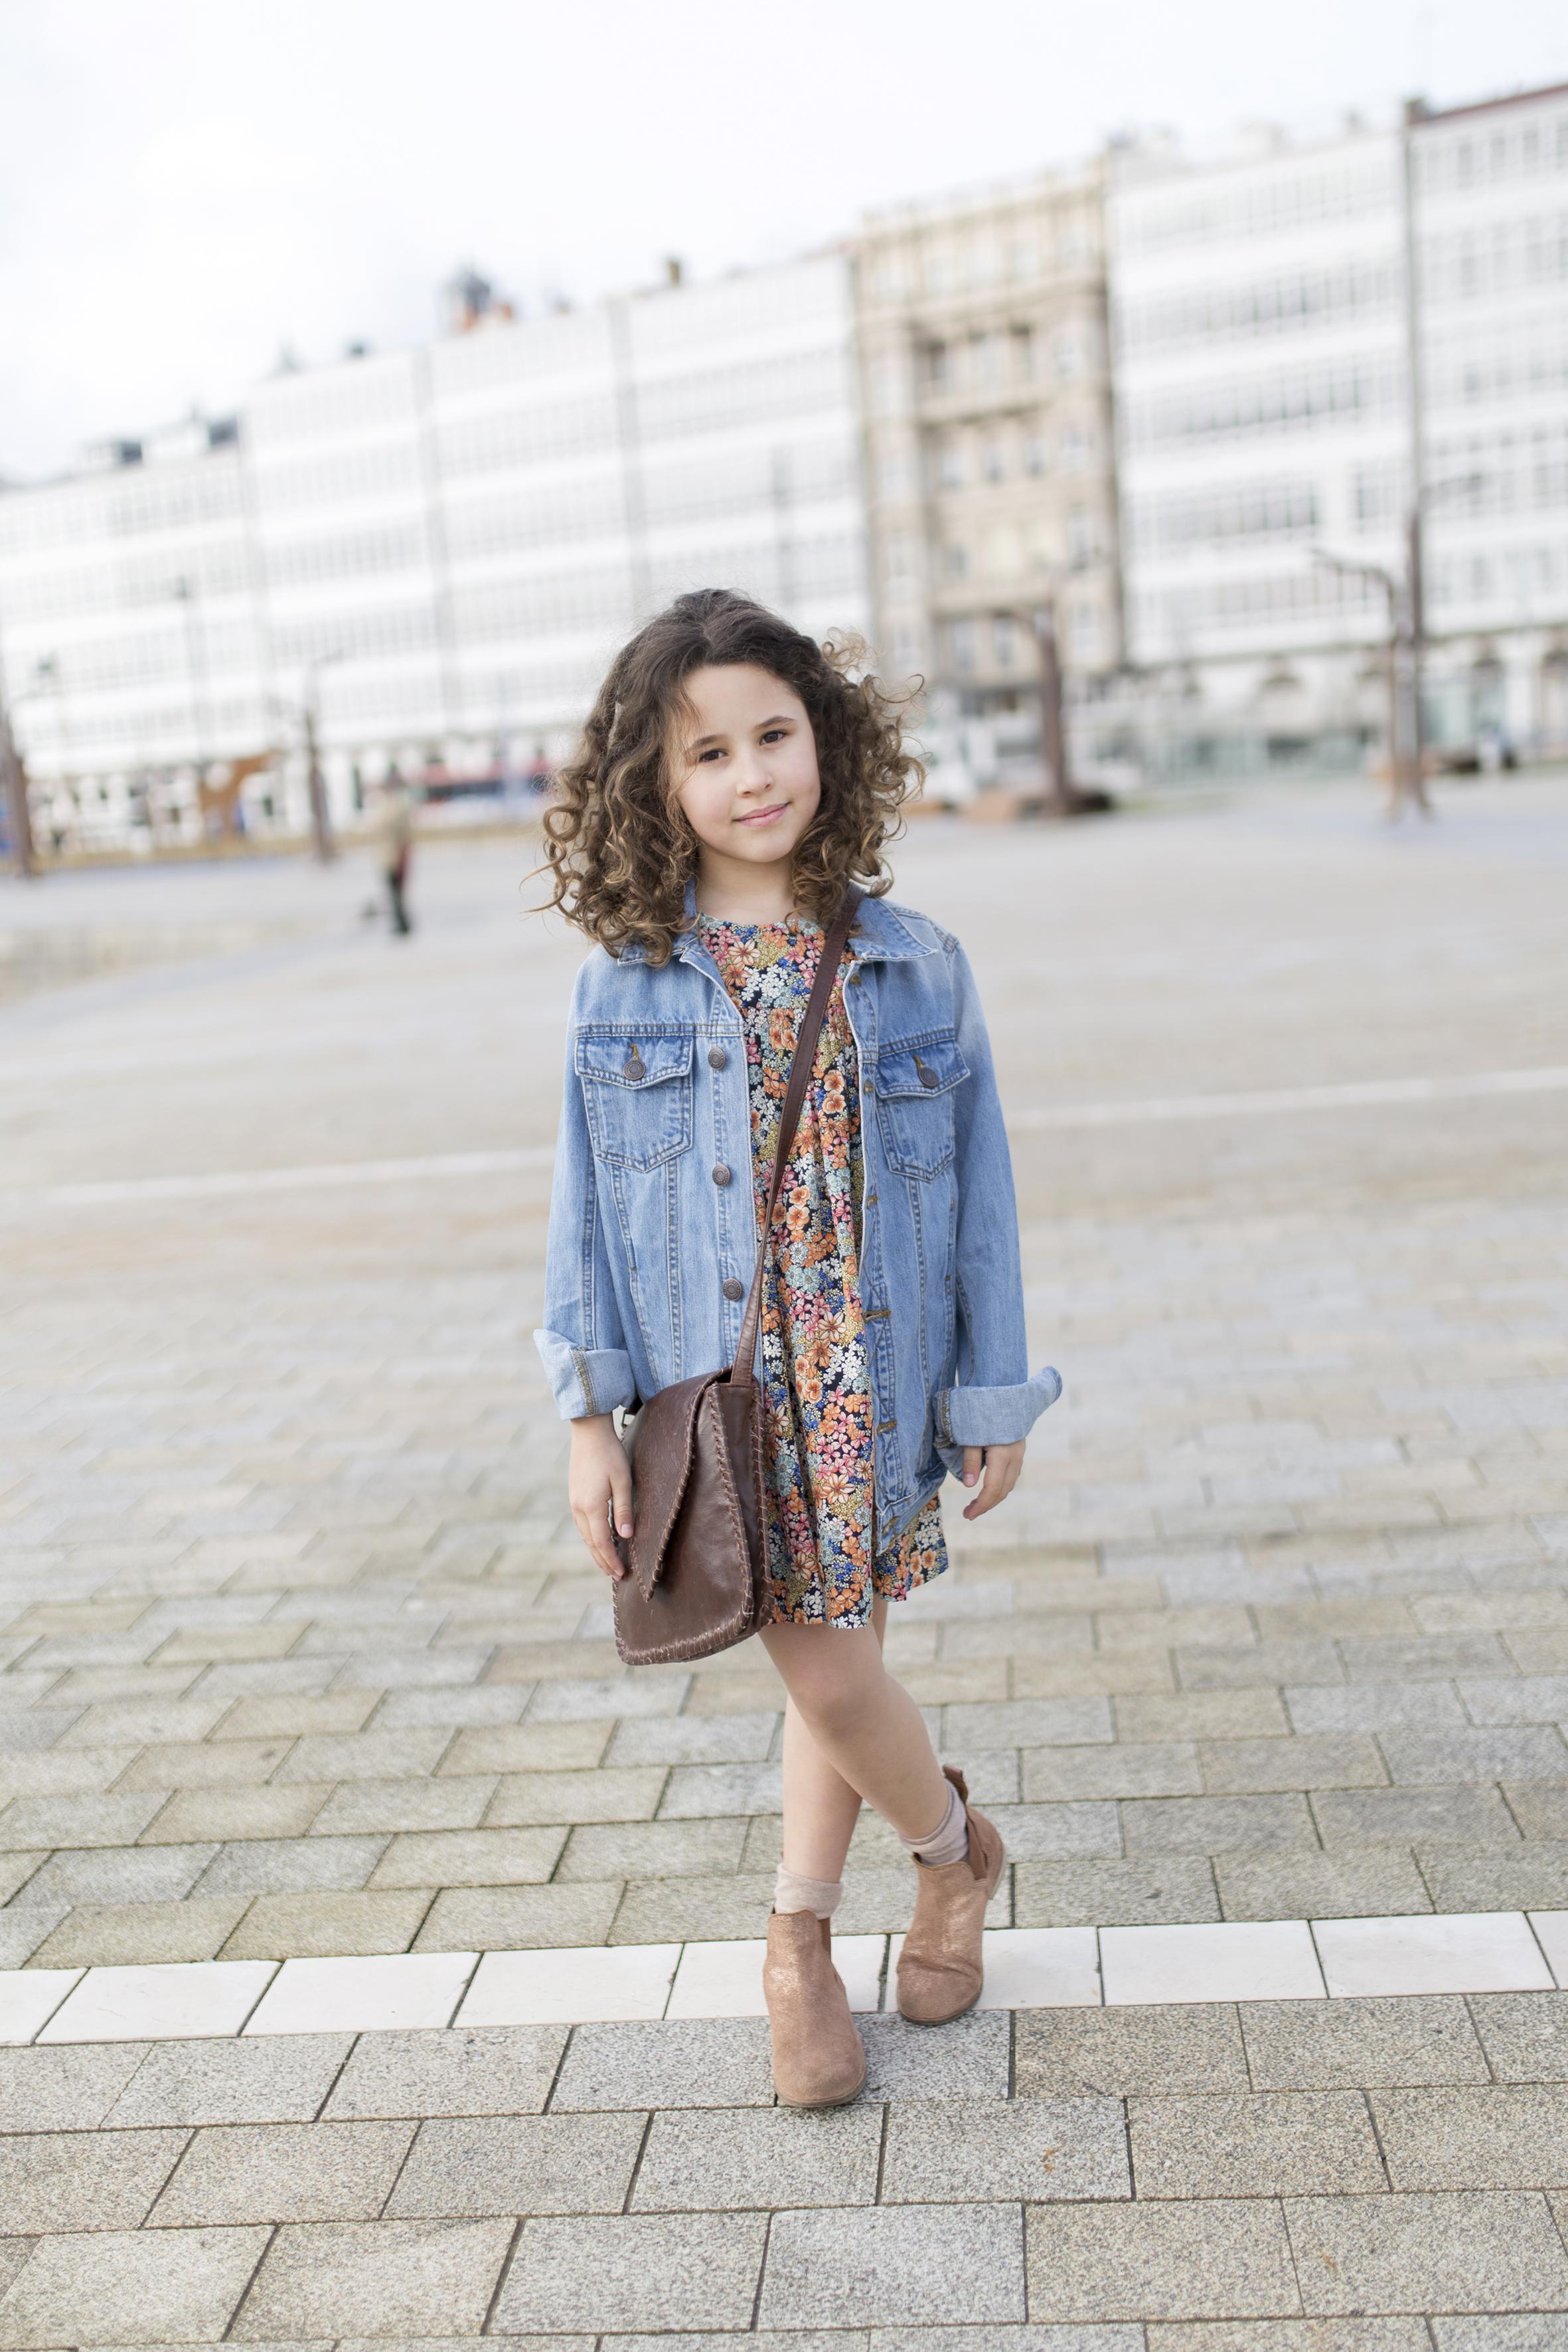 urban outfitters bag-vintage-denim jacket-My partner-fashion-moda-street style-descalzaporelparque-blogger-coruña-niños-jimena-zara kids